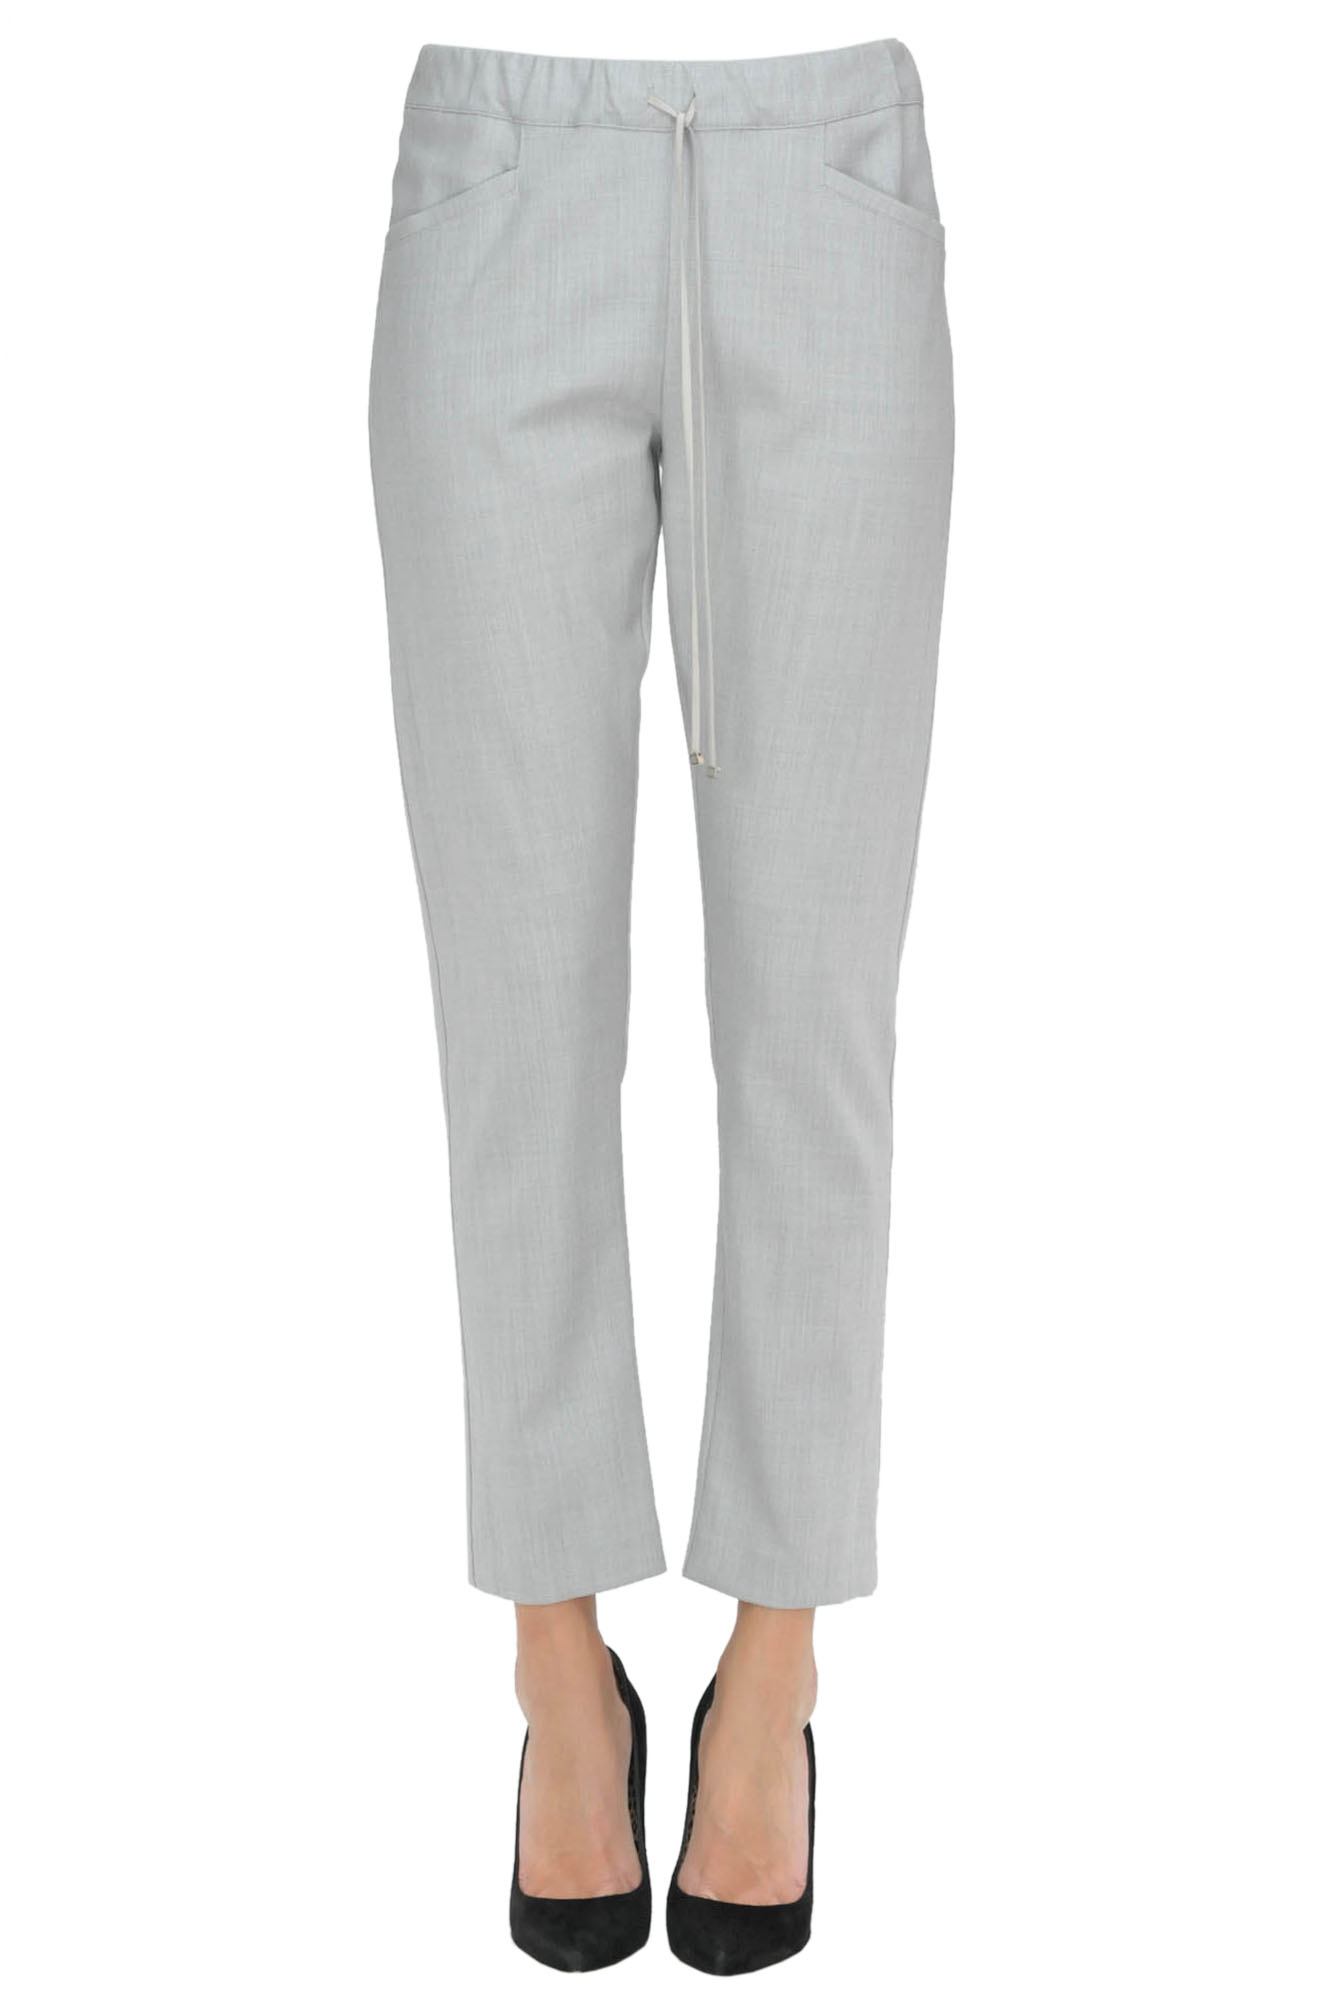 Image of Pantaloni in misto lana